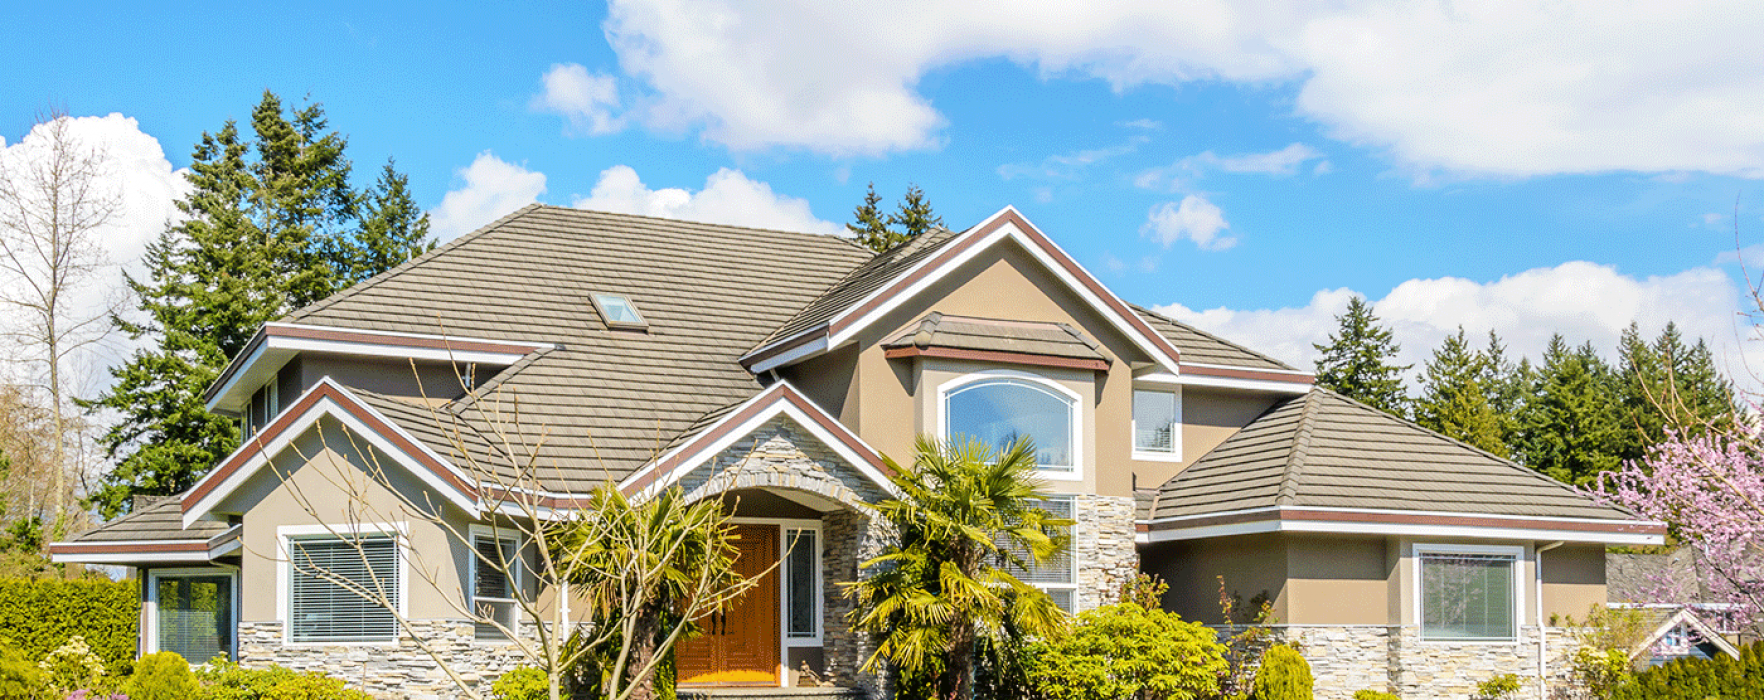 34ce4ac41d5c136b1885cbf9e401917a - Better Homes And Gardens Real Estate Innovations